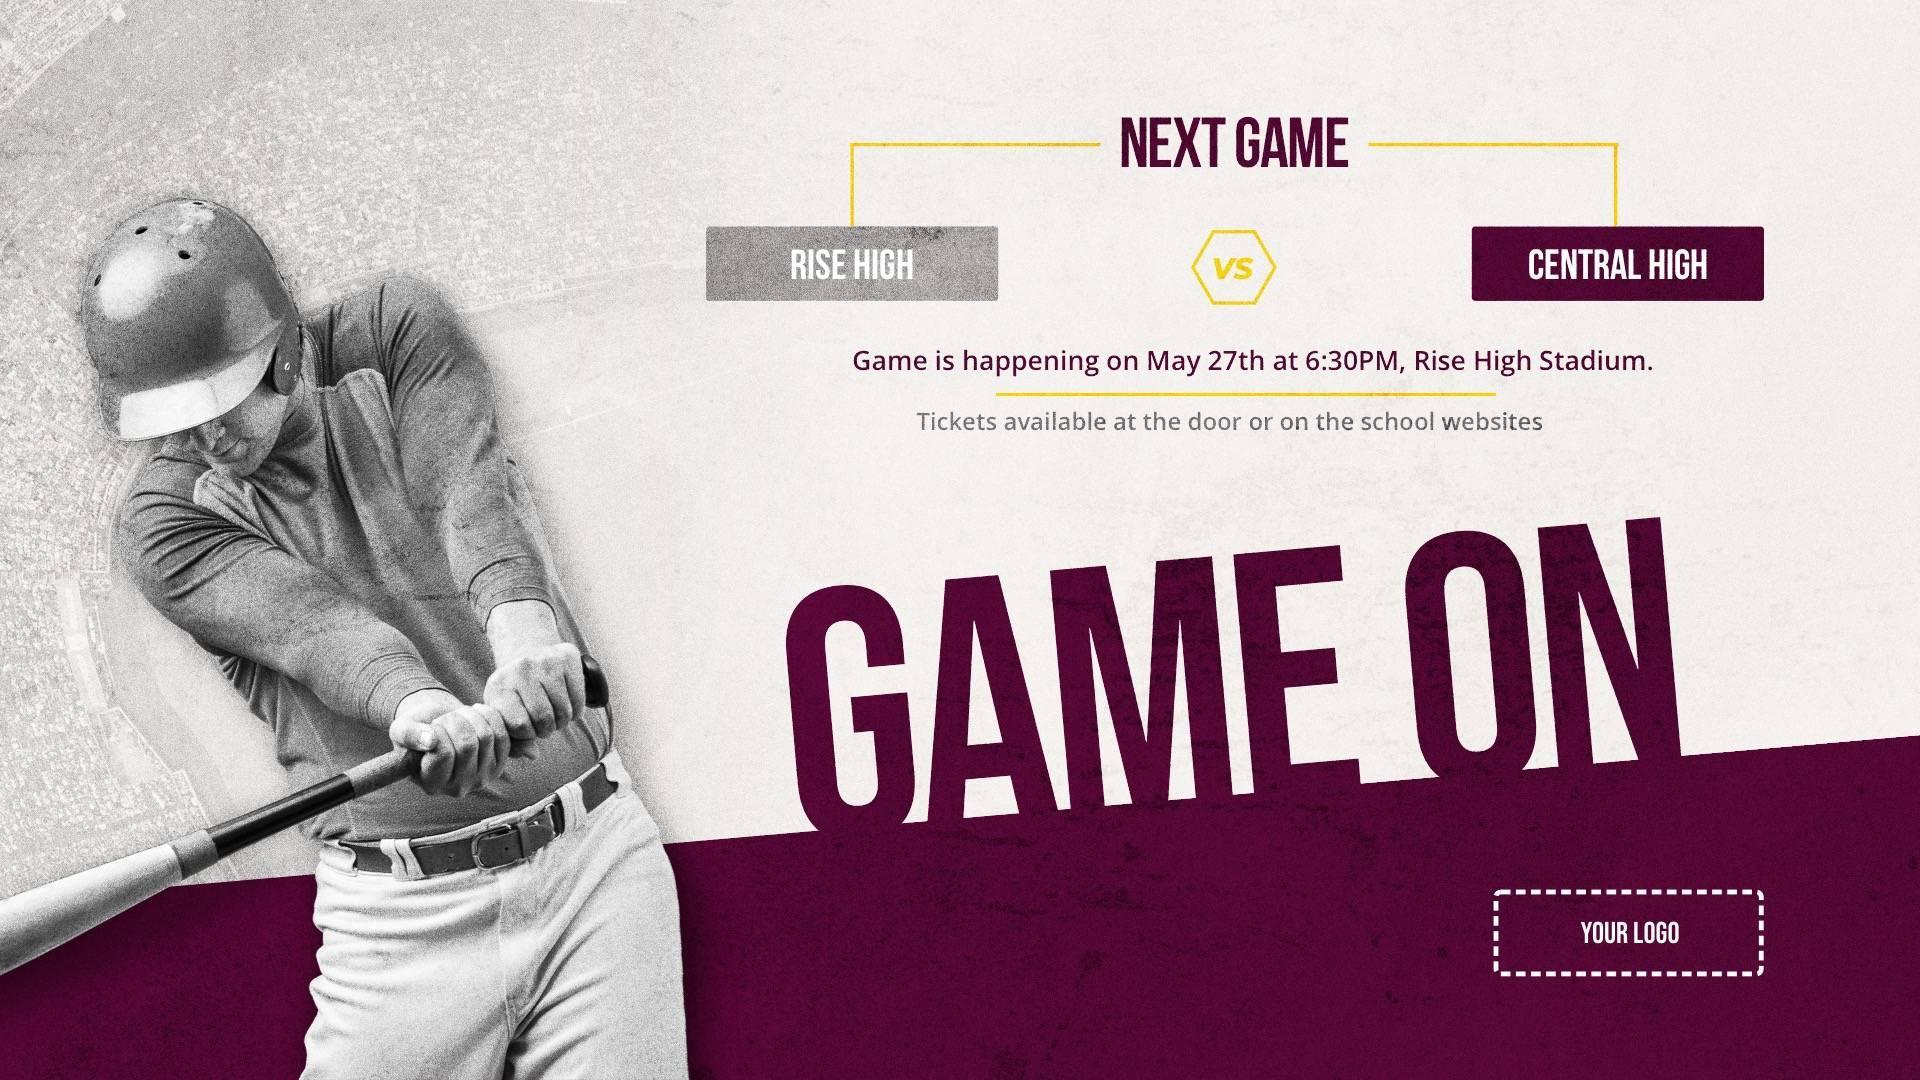 Baseball Game - Sports Digital Signage Template